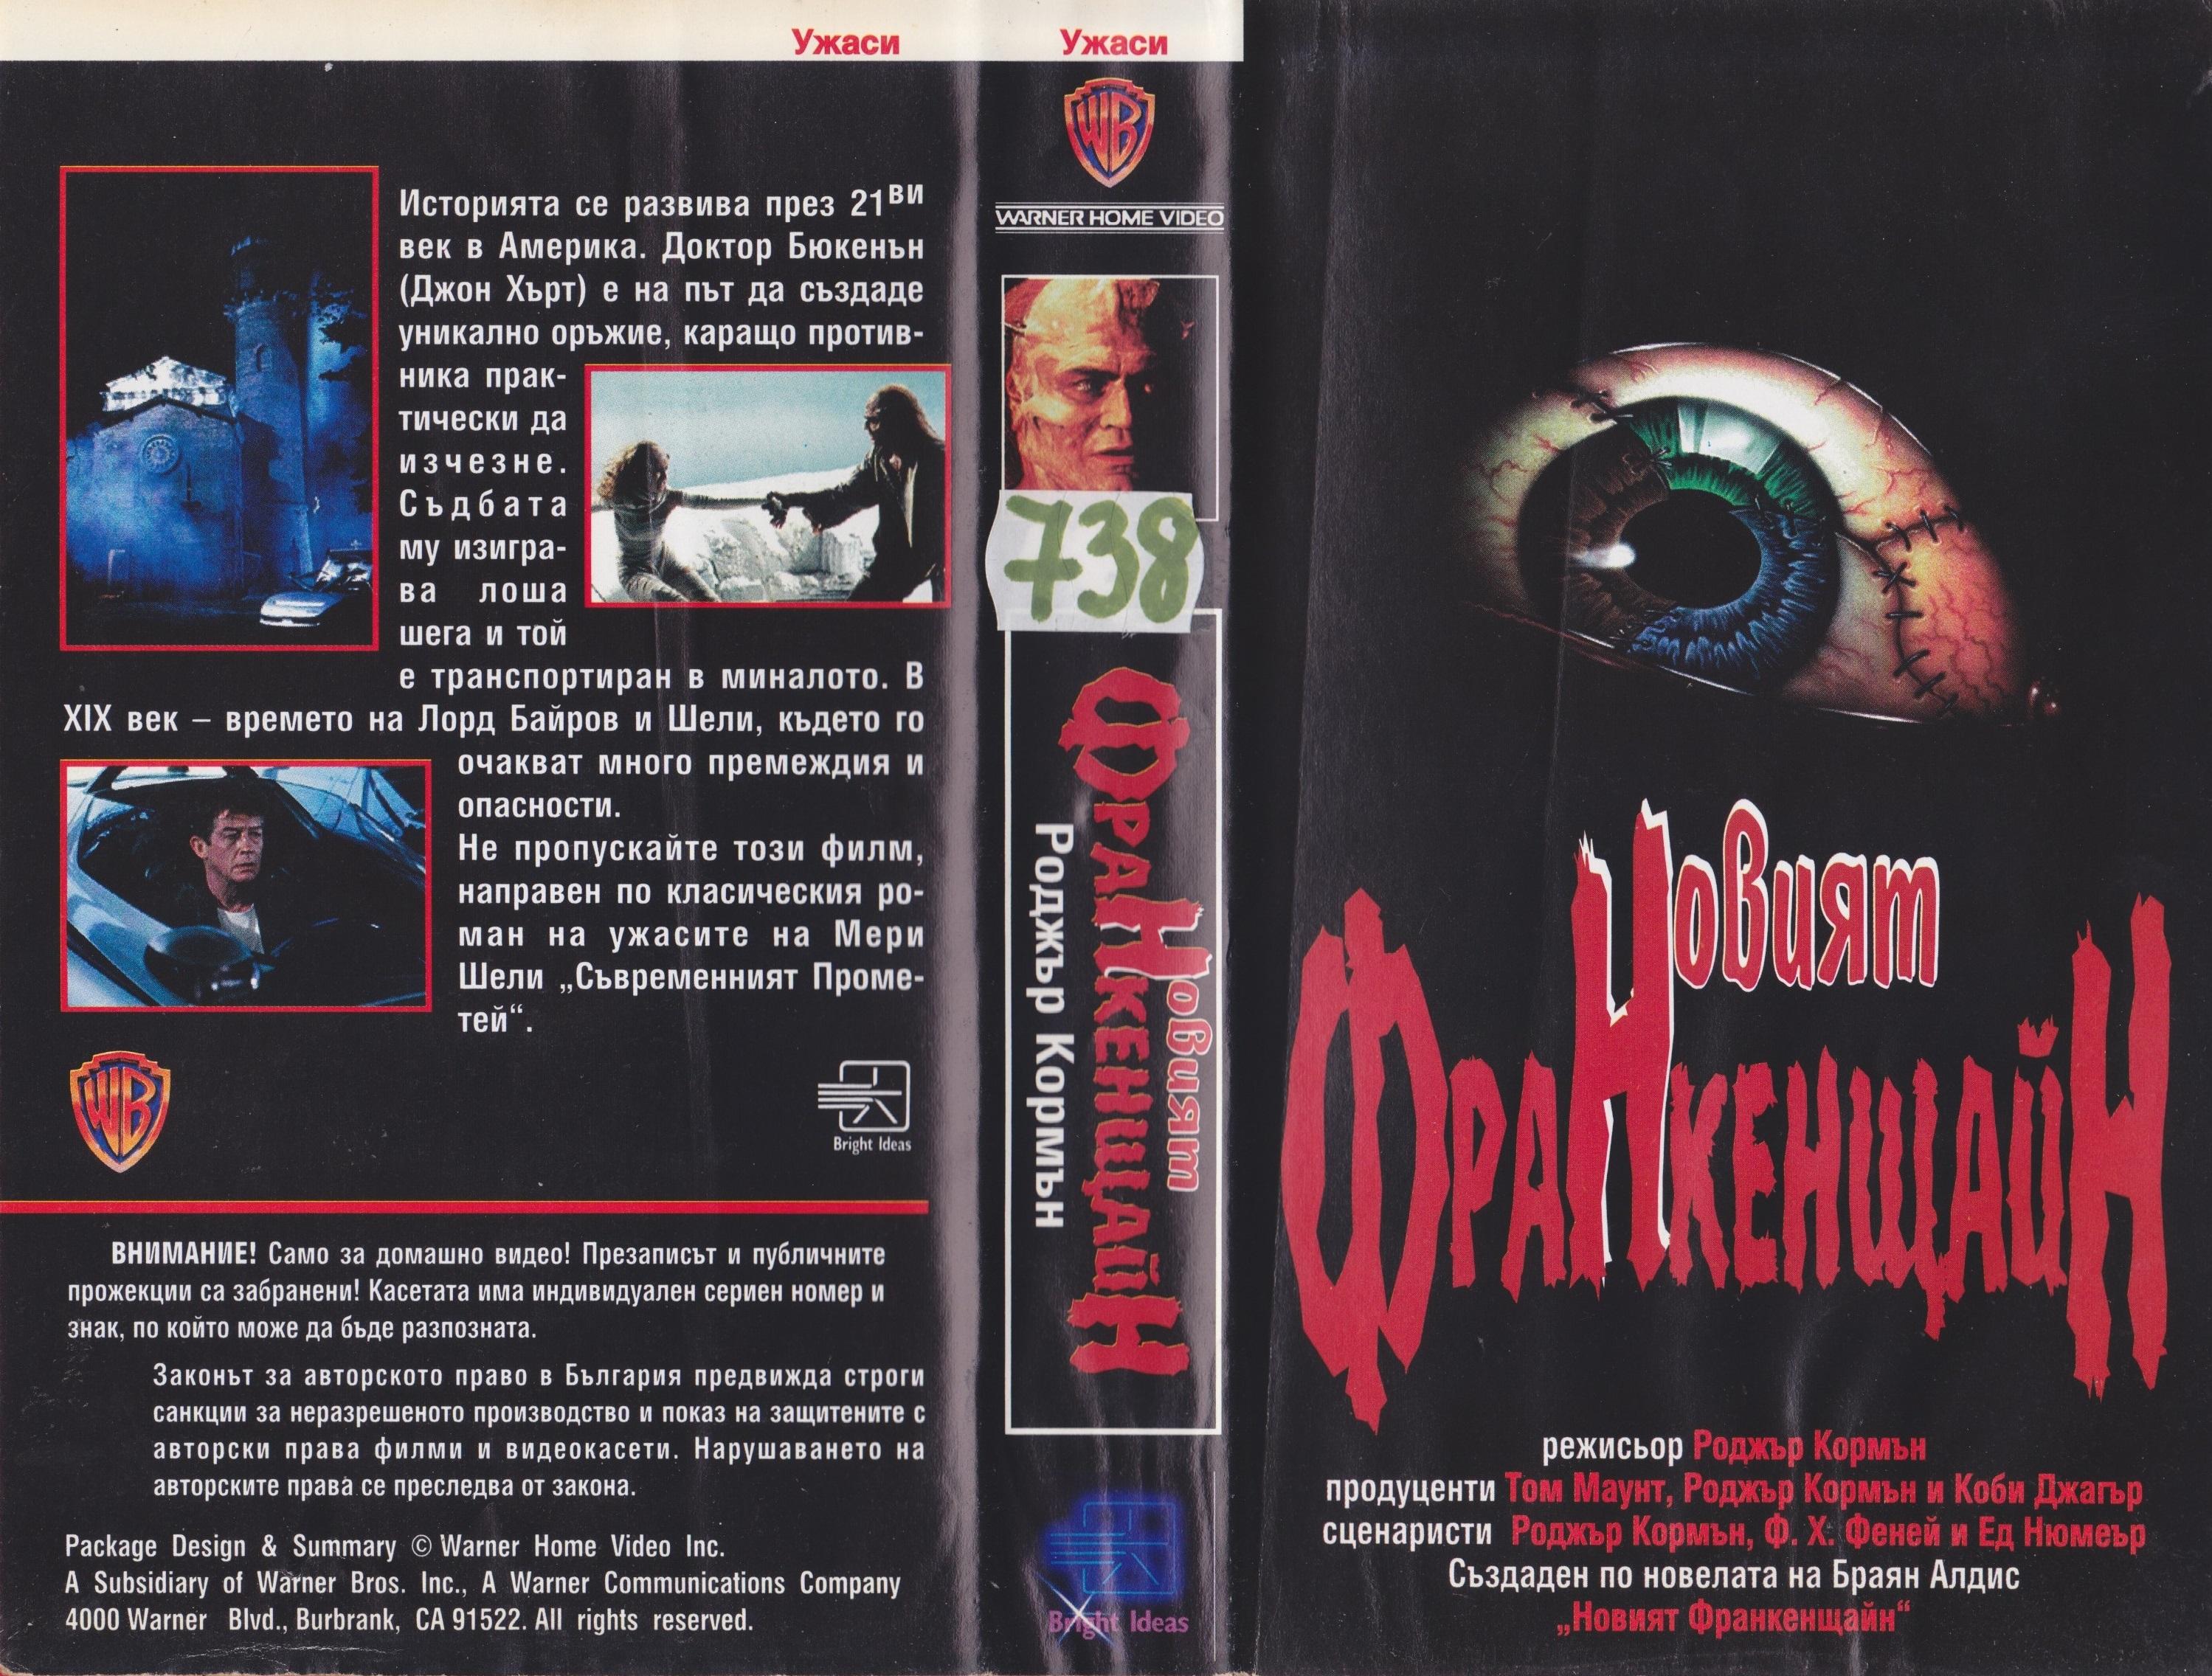 Новият Франкенщайн филм постер